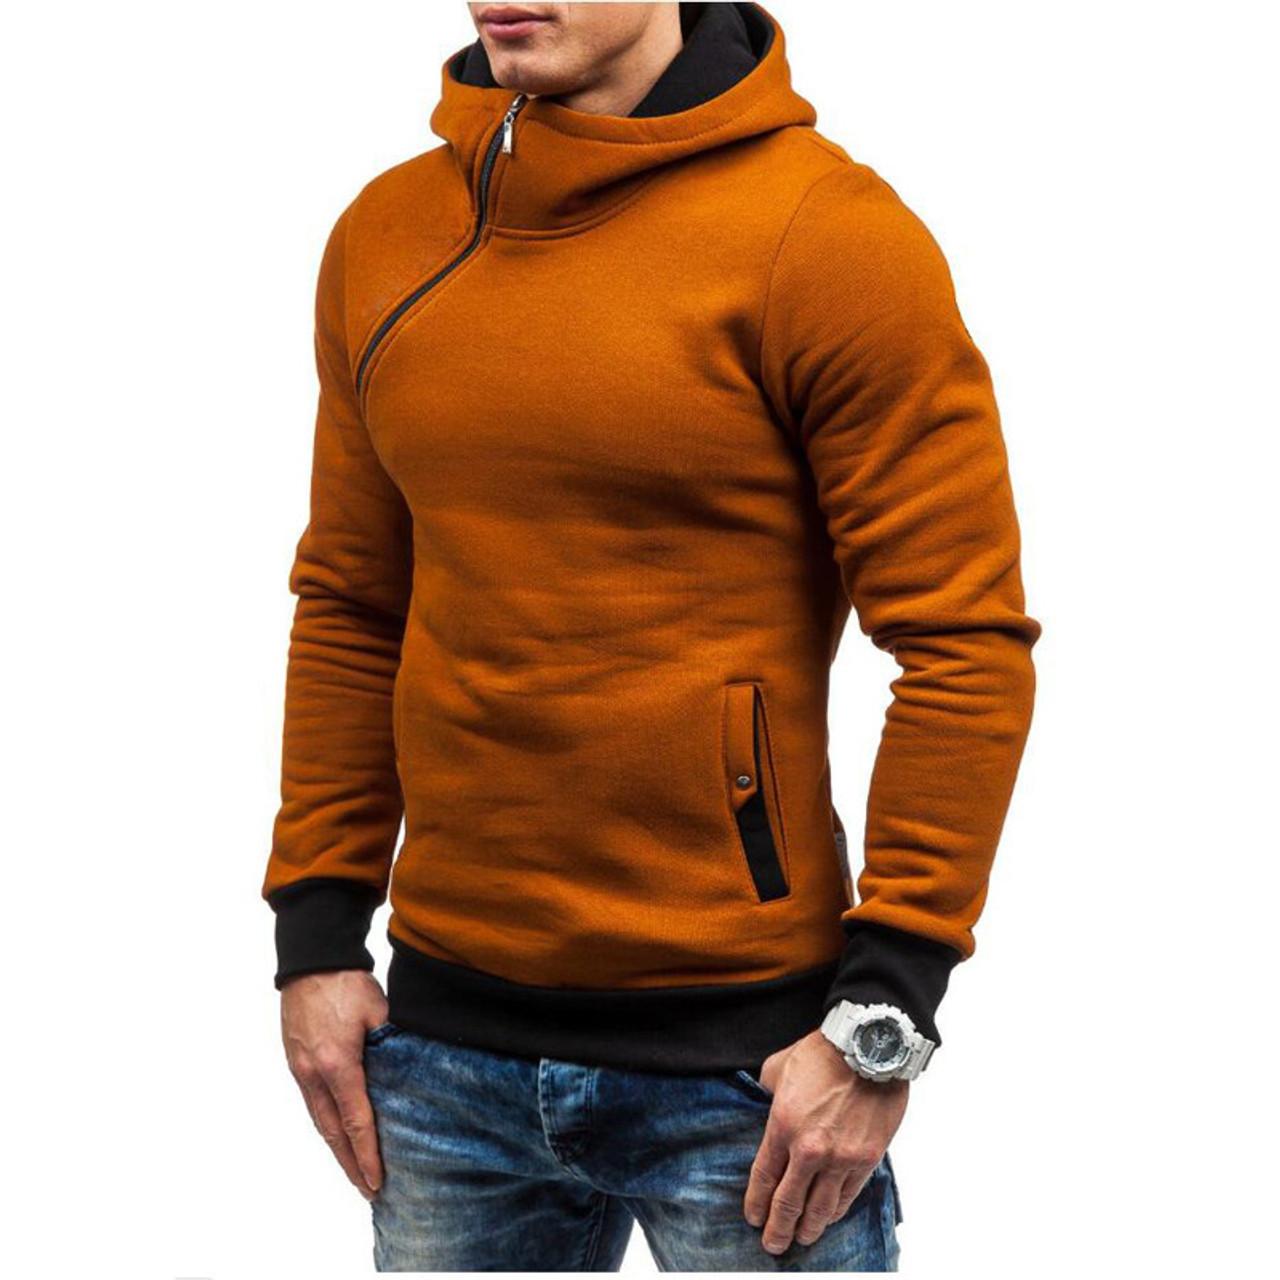 Men's Clothing Brand 2018 Hoodie Slim Soild Color Hoodies Men Fashion Tracksuit Male Sweatshirt Hoody Mens Purpose Tour Xxl